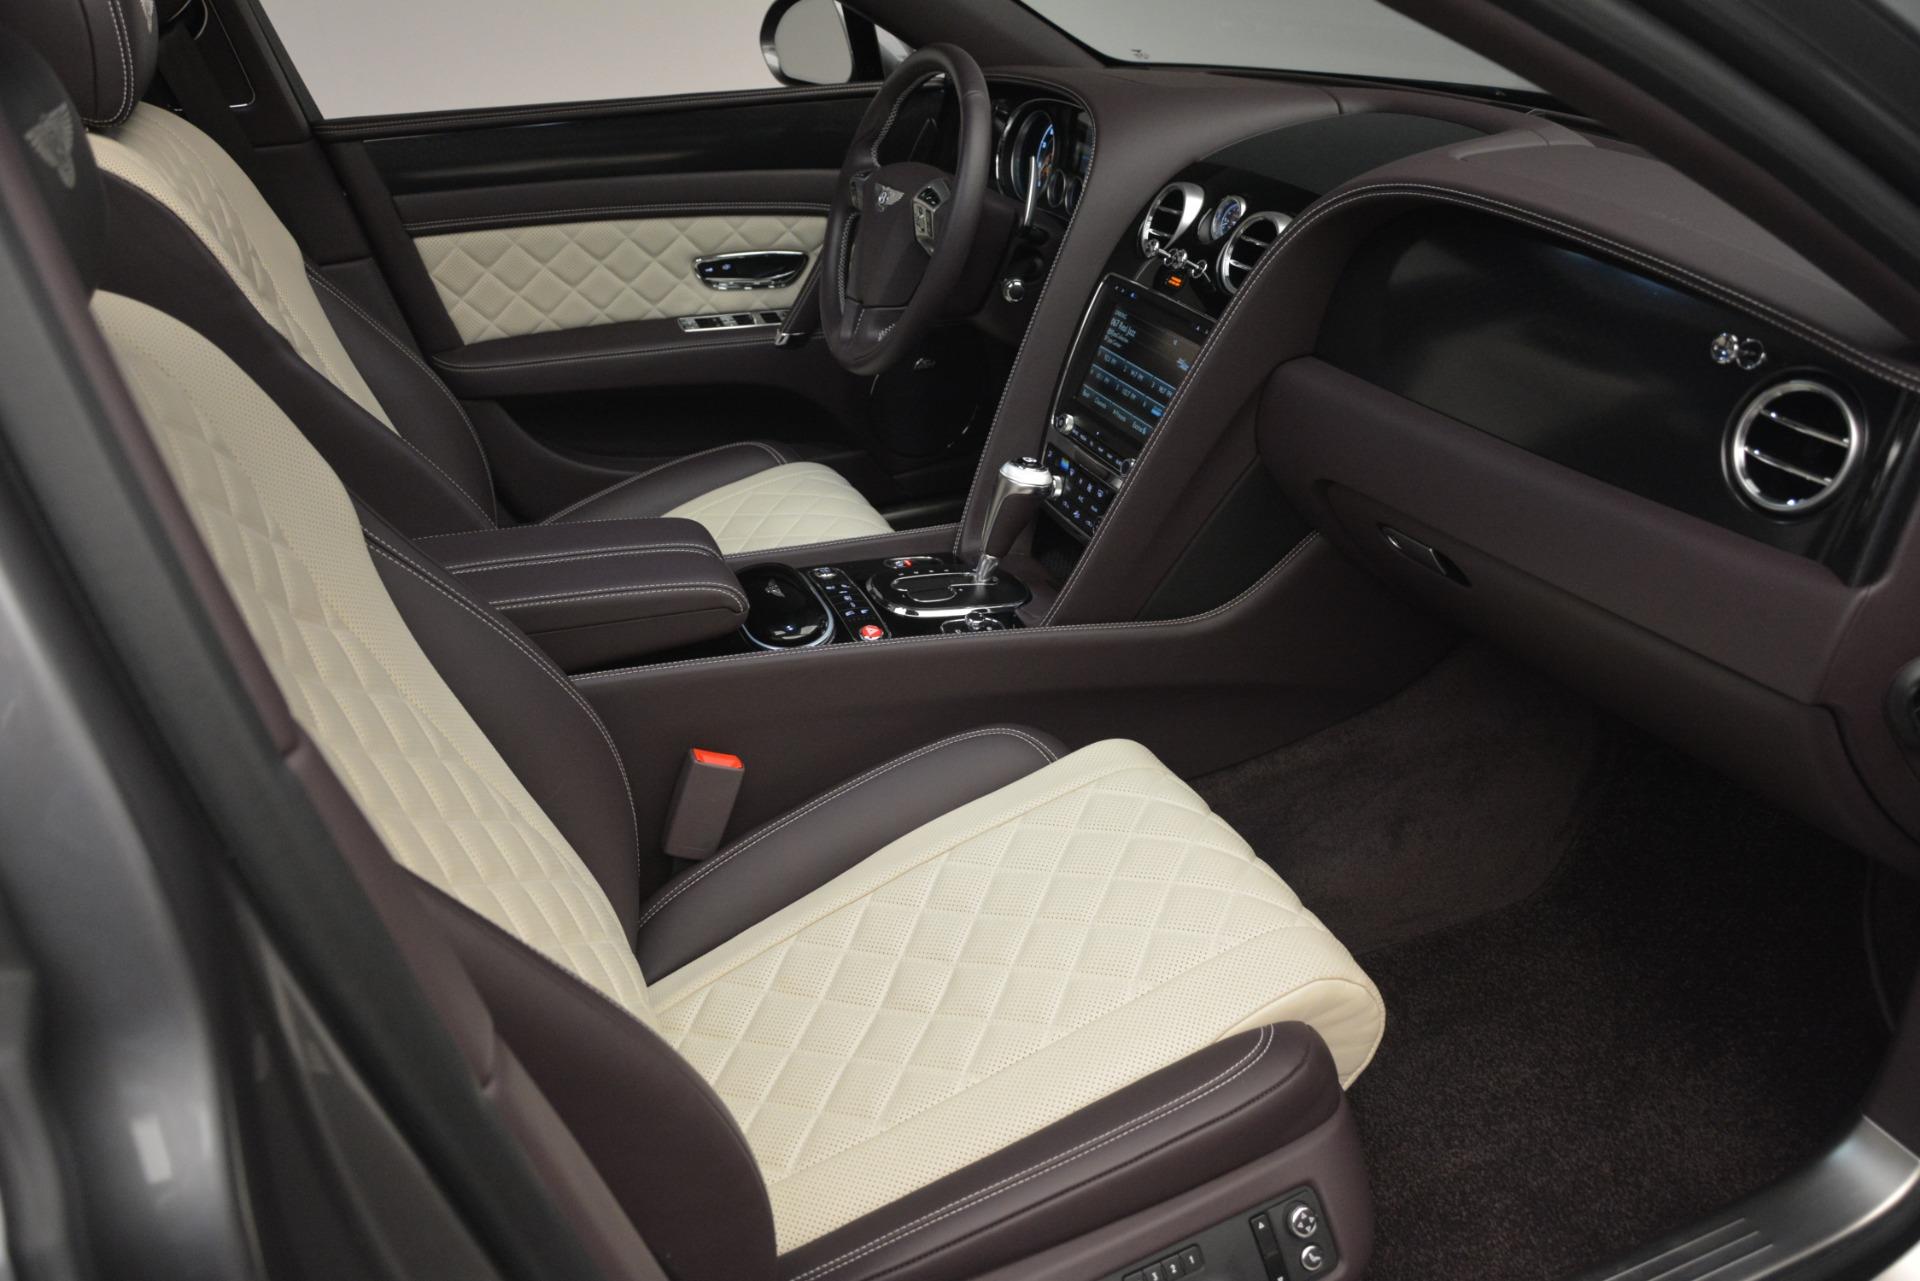 Used 2018 Bentley Flying Spur W12 S For Sale In Westport, CT 2973_p28